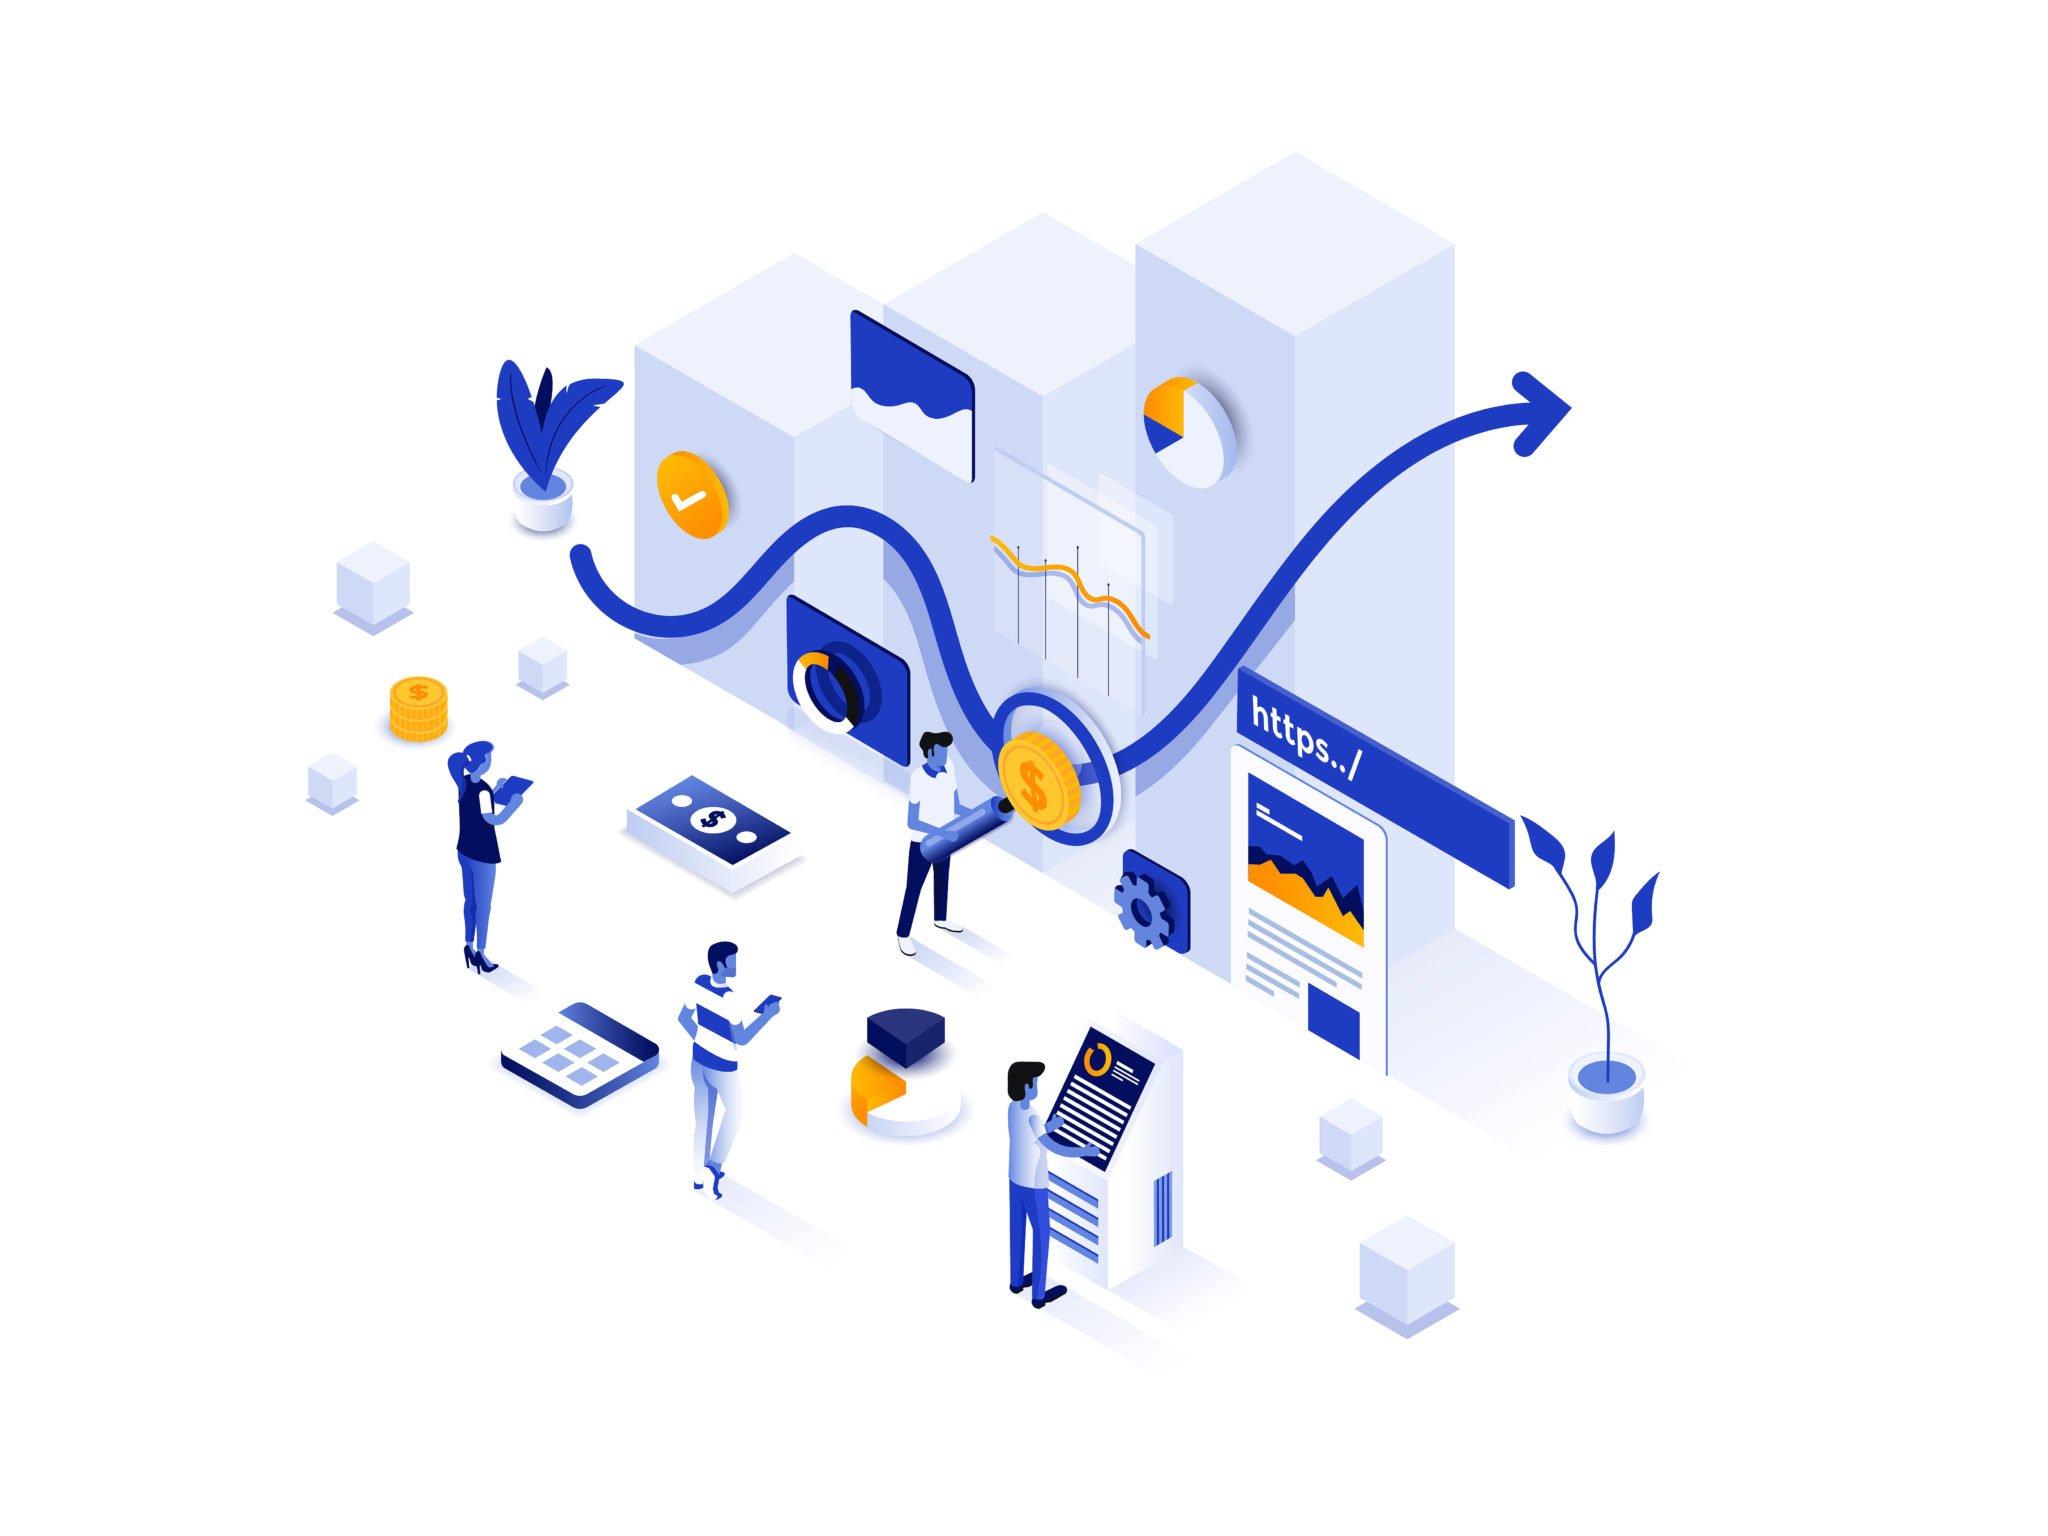 Modern-Isometric-Illustration-design-Investment-Solutions-2048x1536